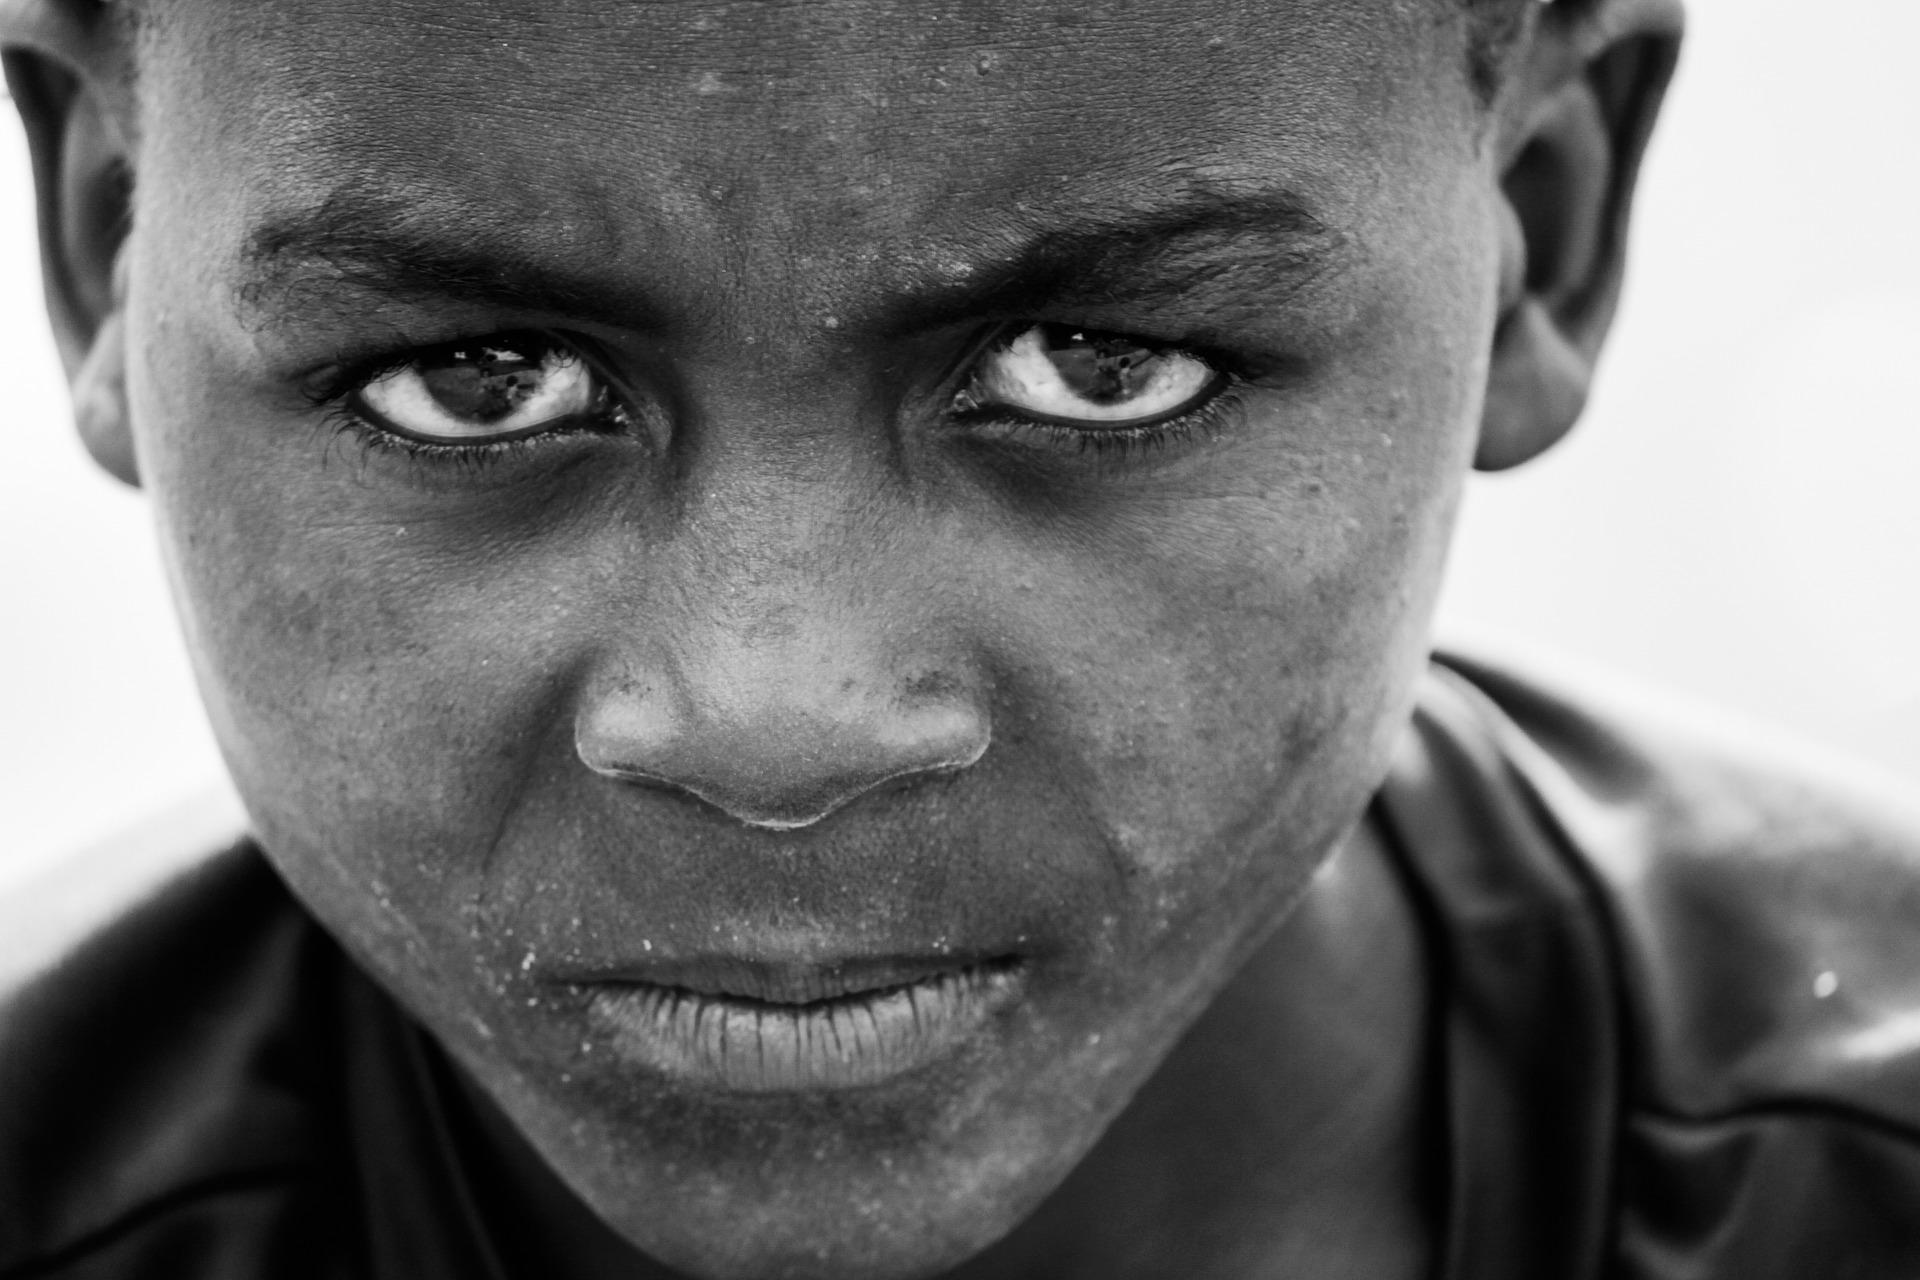 African boy (Credit: pixabay/wjgomes)